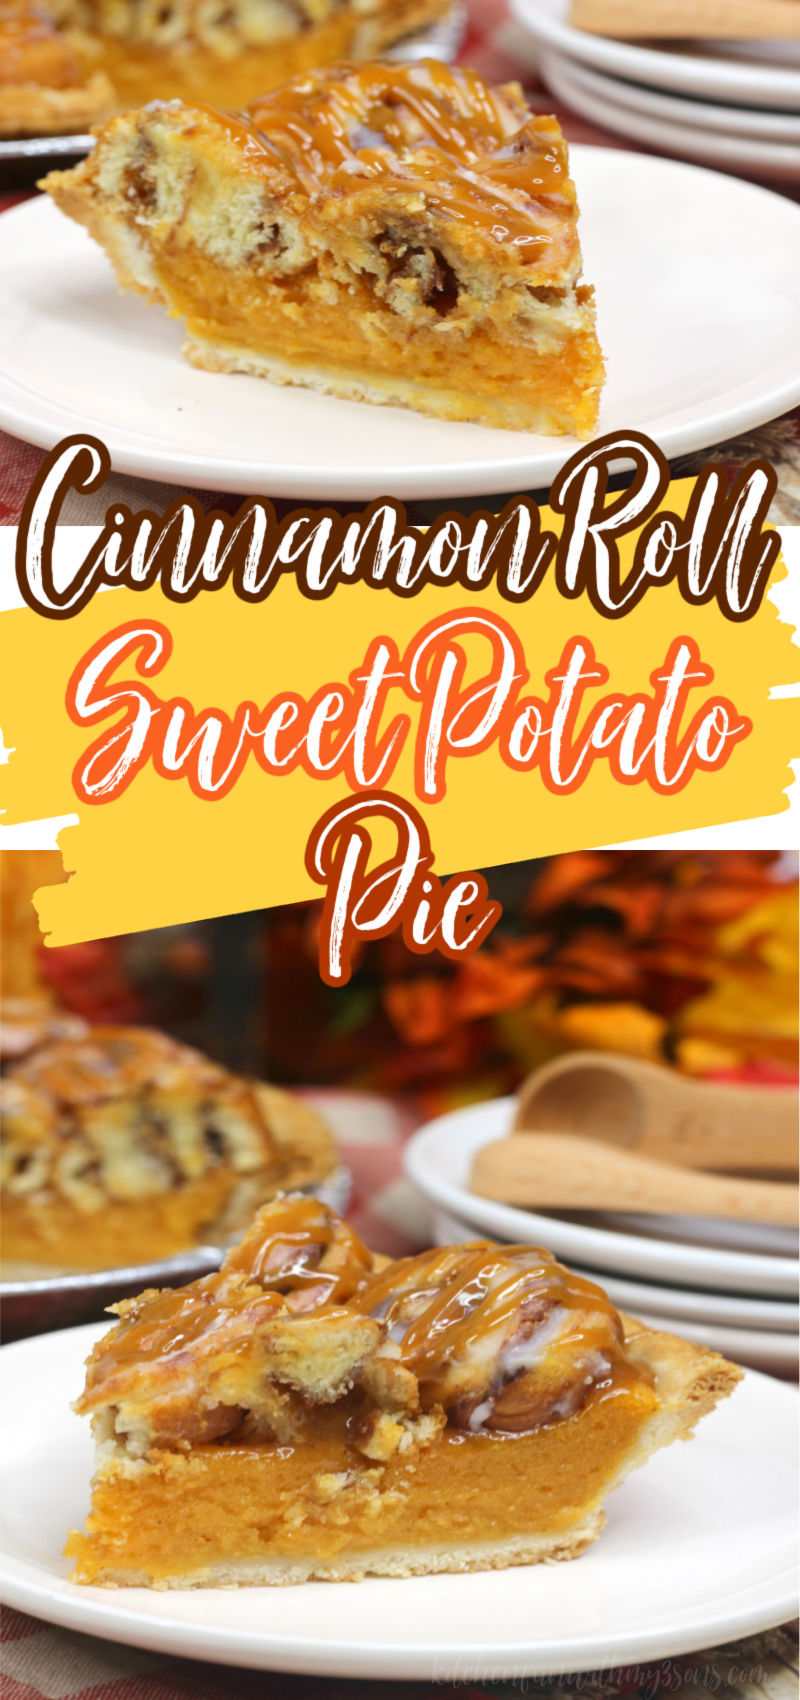 cinnamon roll sweet potato pie